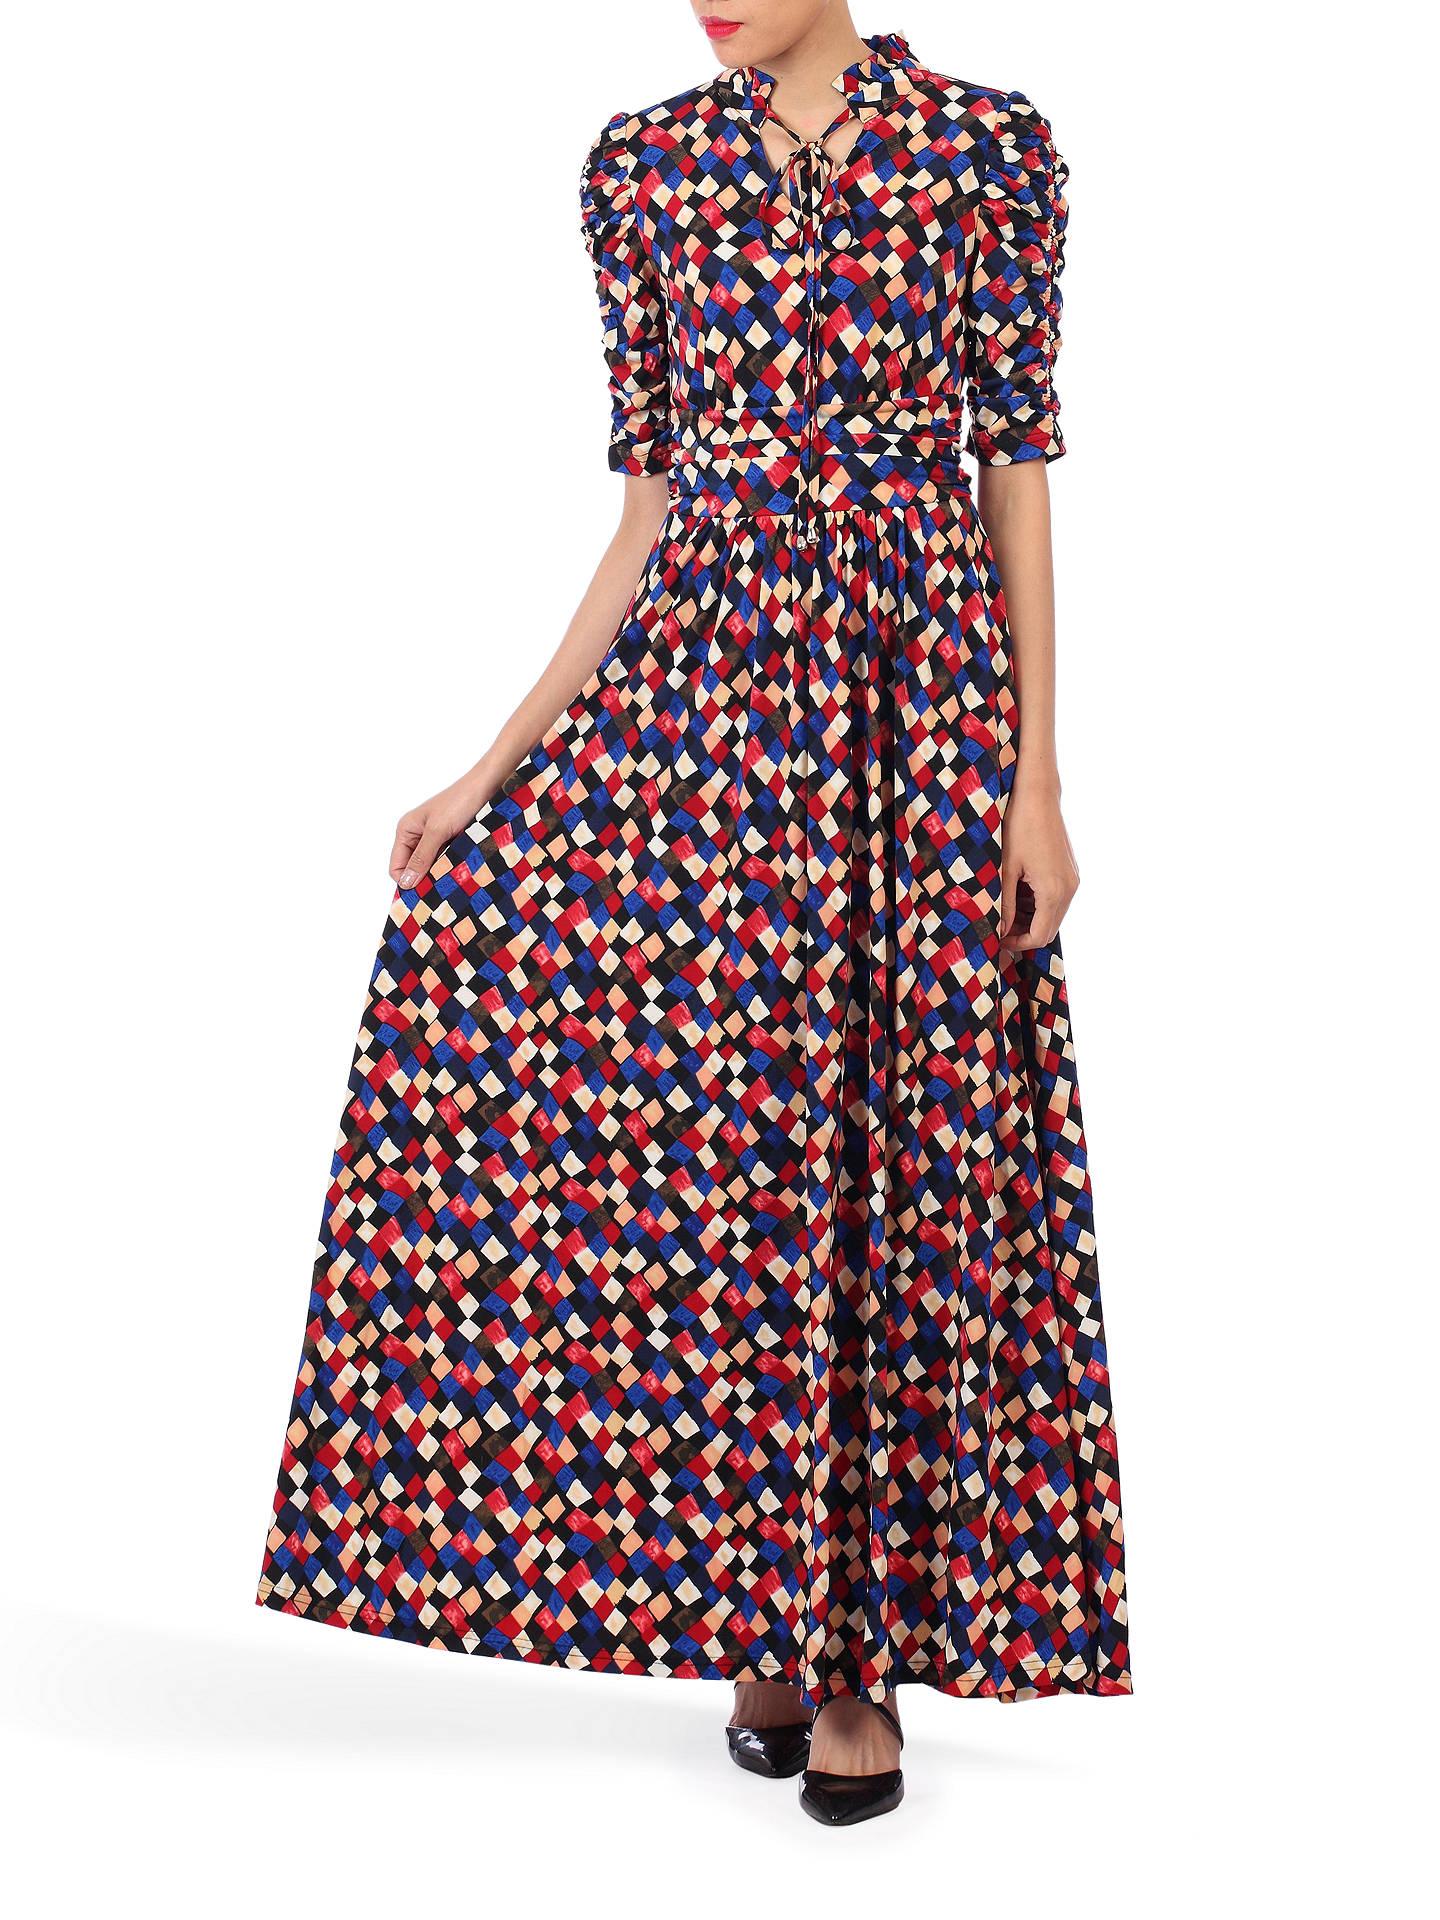 939bc57d81 Buy Jolie Moi Tie Collar Maxi Dress, Black Geo, 10 Online at johnlewis.